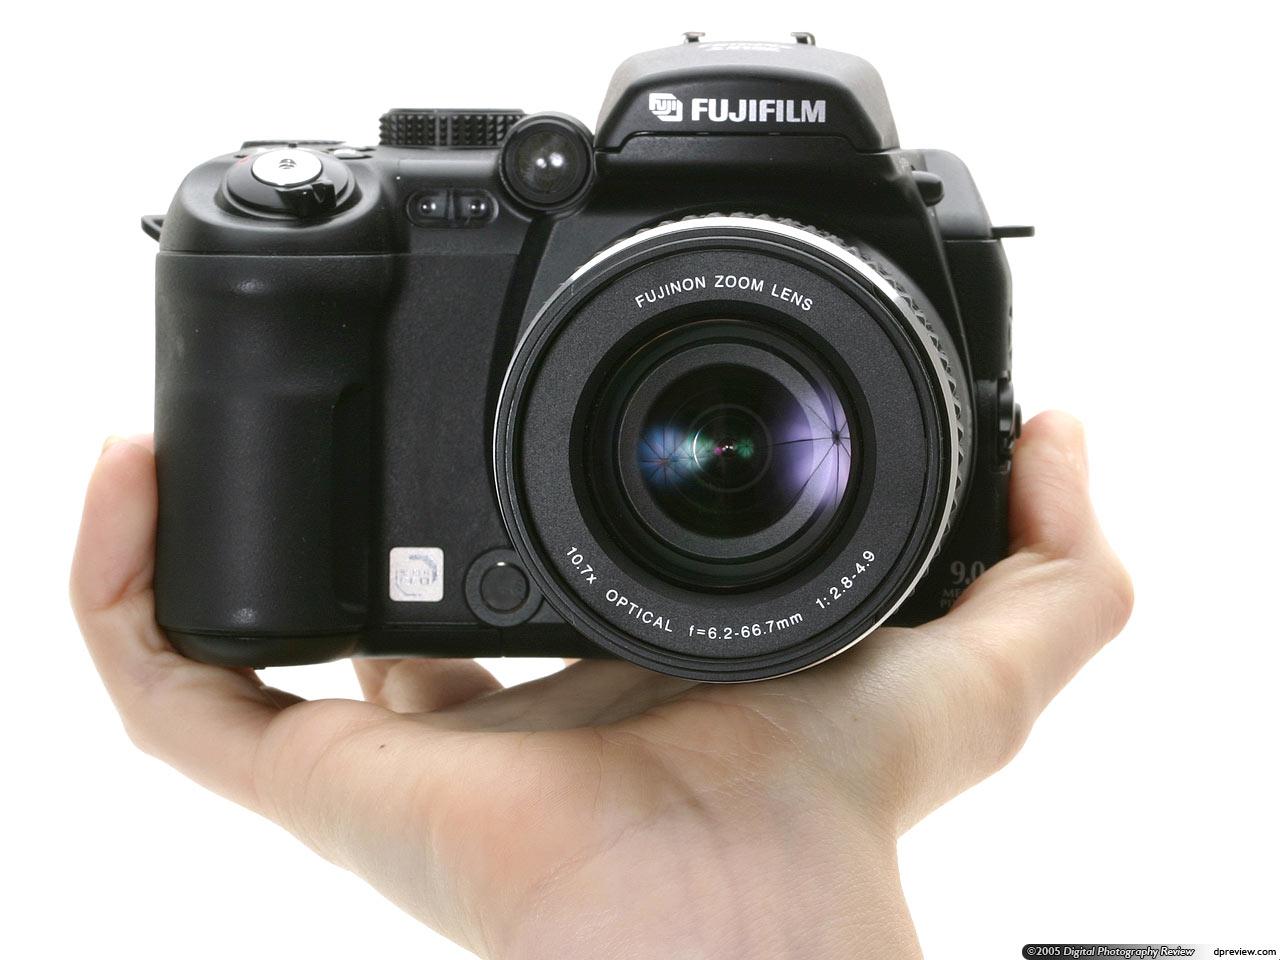 Fujifilm FinePix S9000 / S9500 Review: Digital Photography